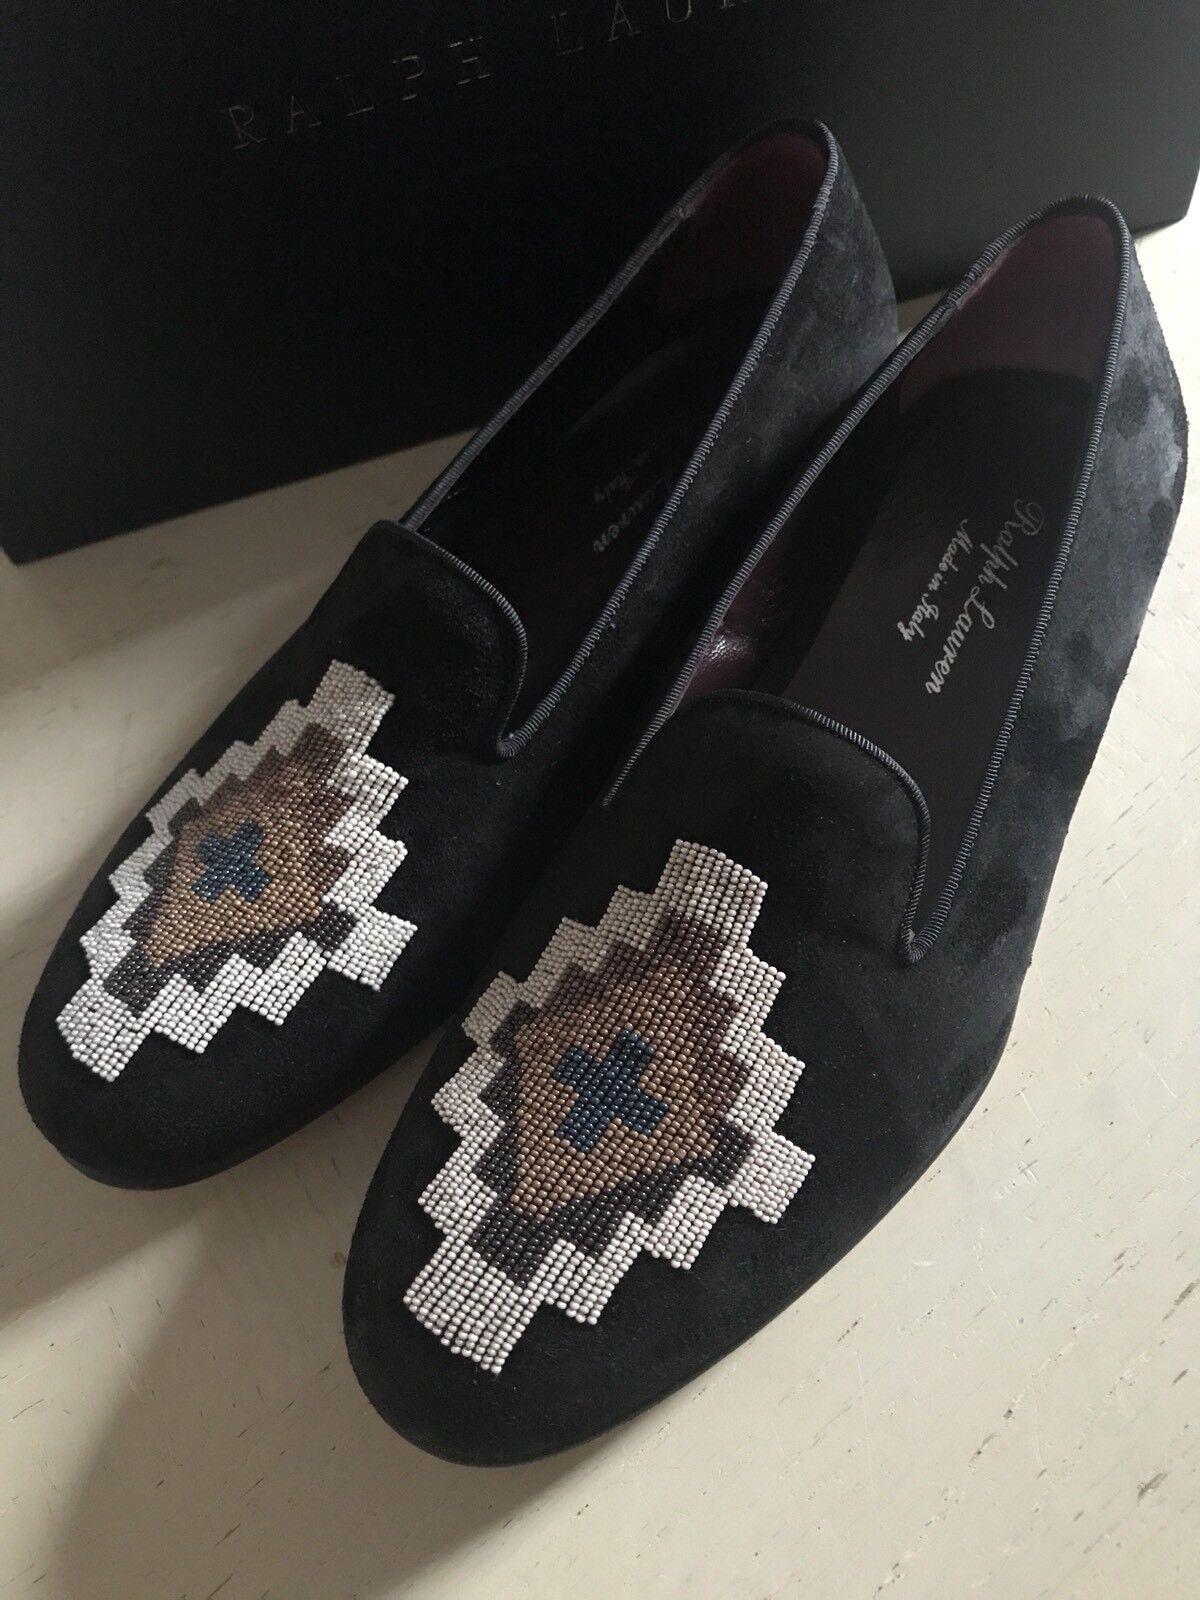 New 1150 Men's Ralph Lauren Purple Label  Suede Slippers Shoes Black 10 US